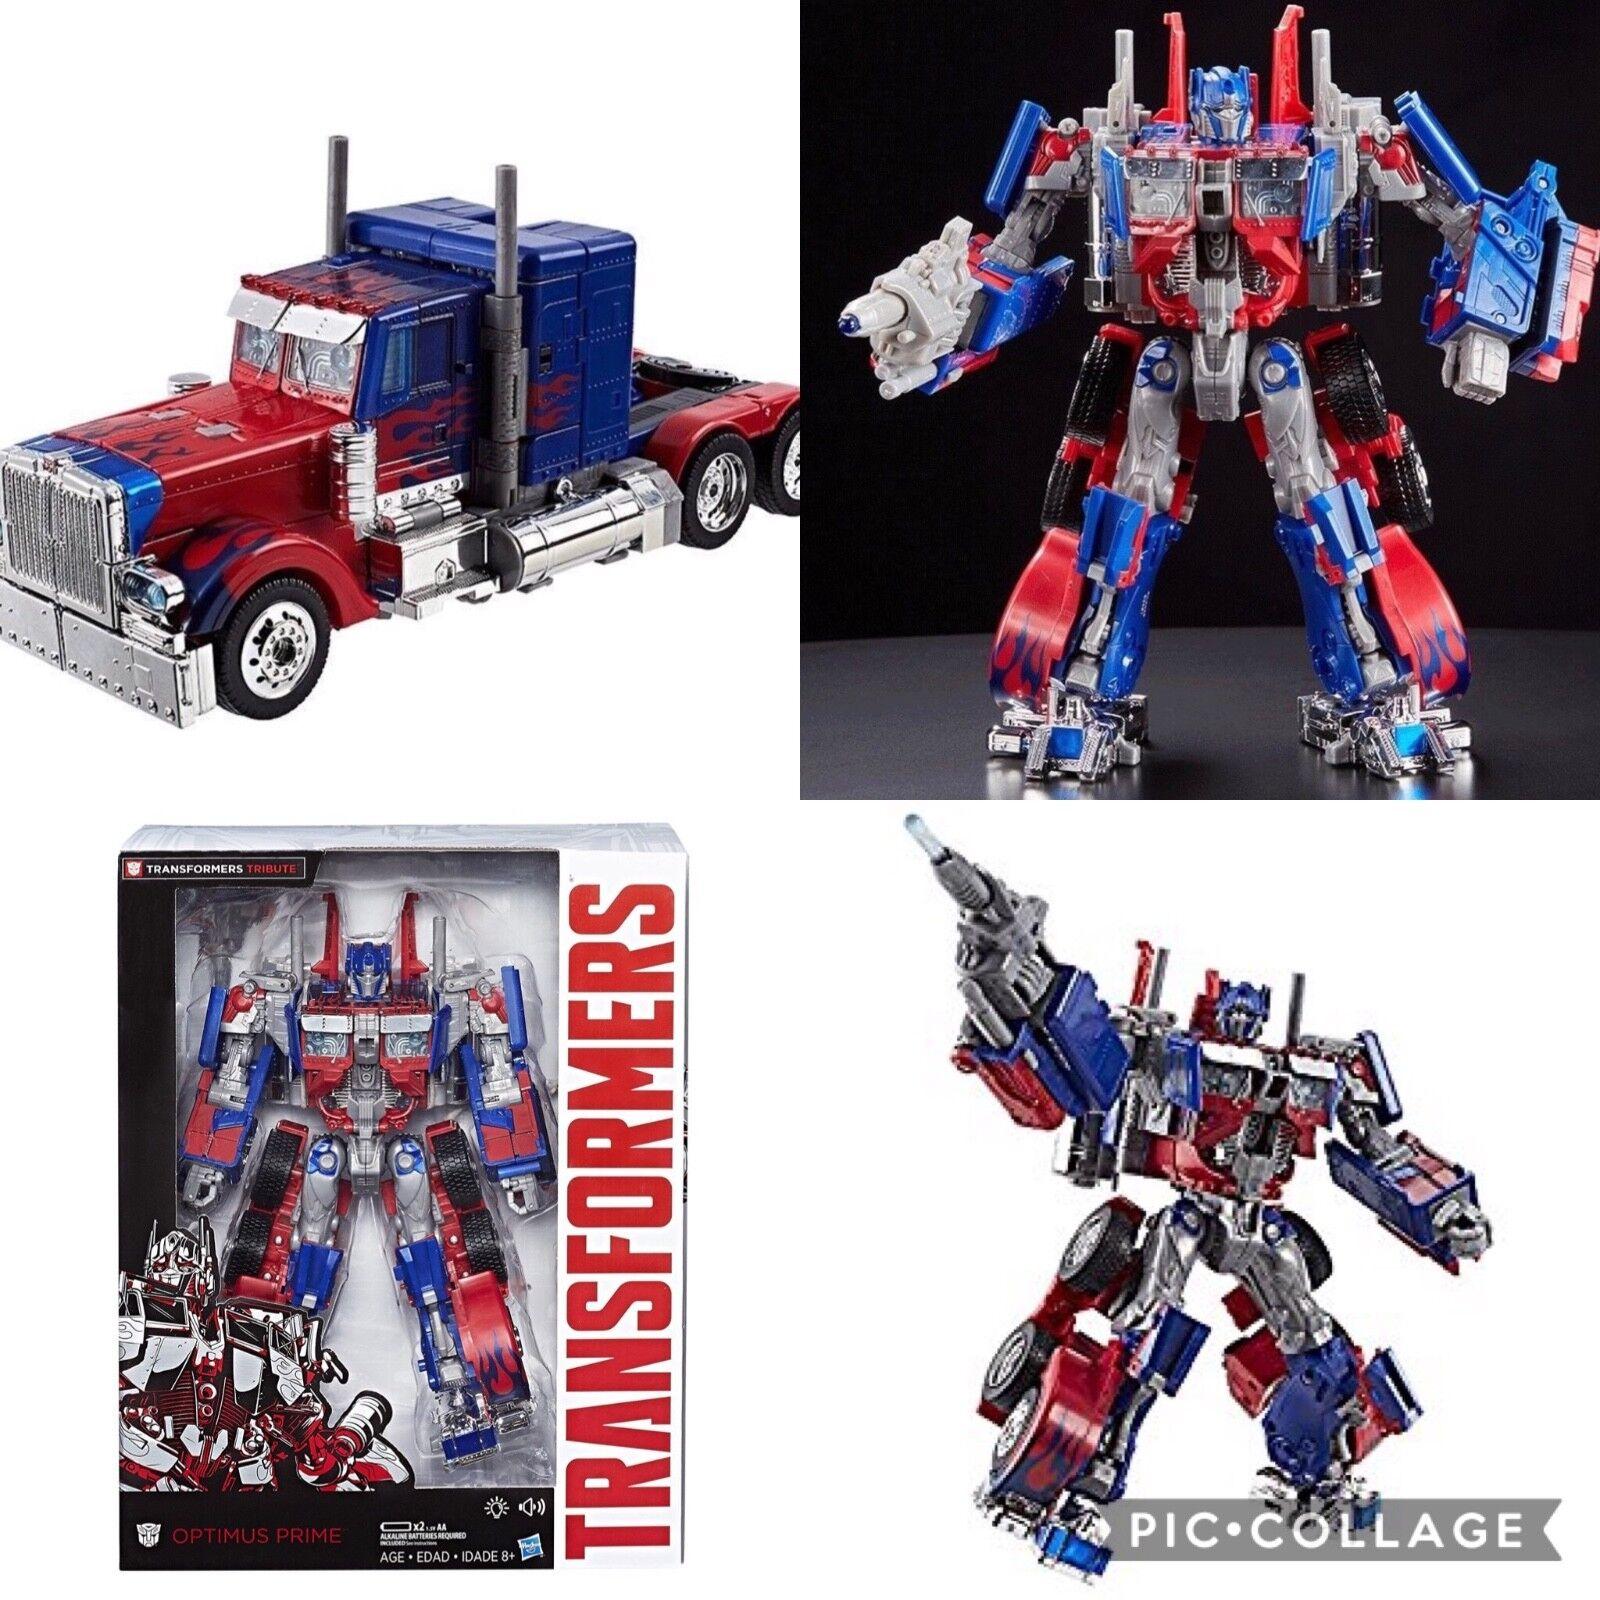 Transformers Movie Anniversary Anniversary Anniversary Edition Optimus Prime NIB 587b21